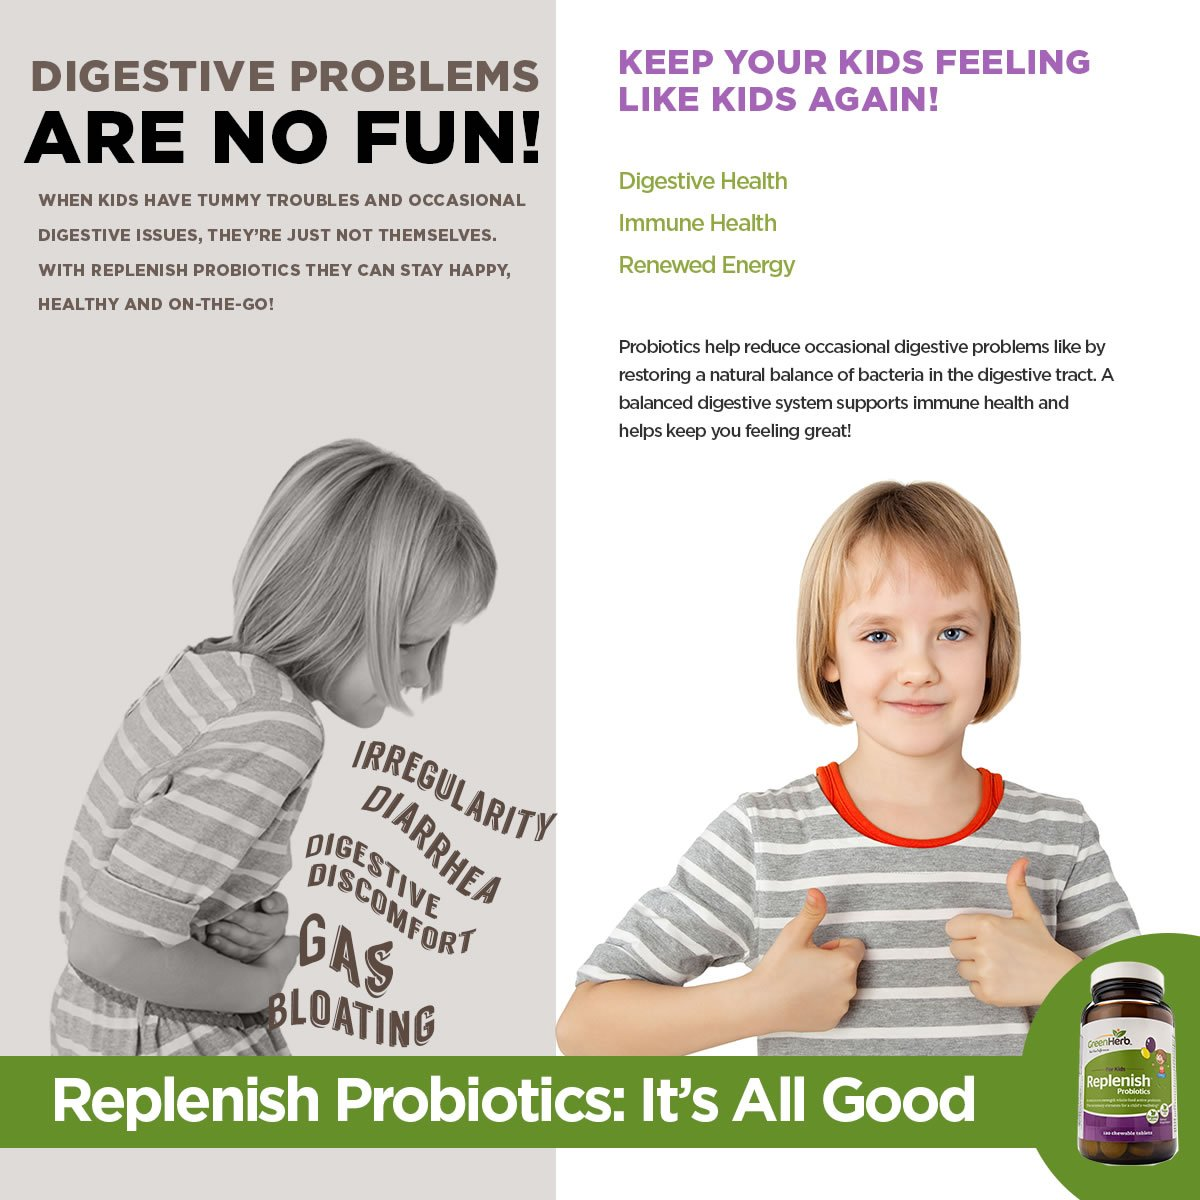 Digestive problems in a child